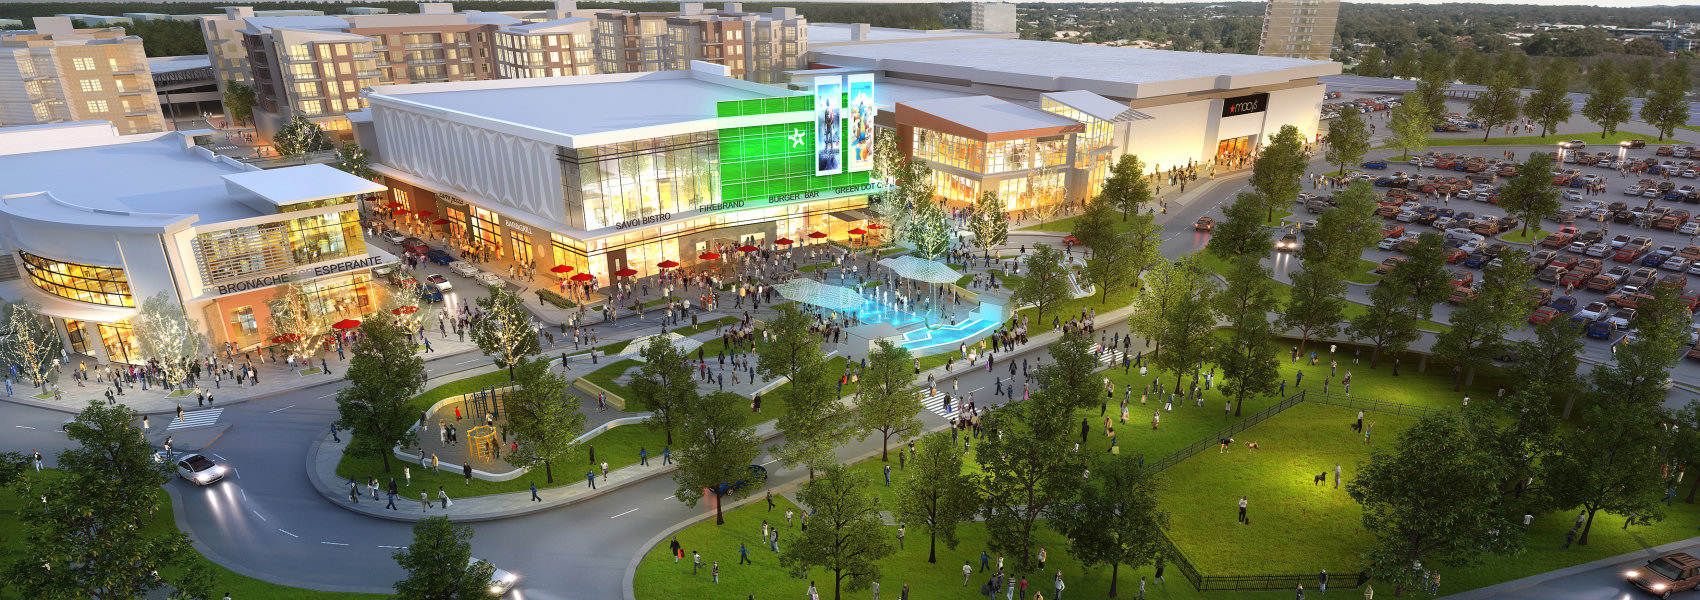 SEQ Figure \* ARABIC            The NEW Landmark – Alexandria, VA - Mall redevelopment to mixed use - Howard Hughes Corporation